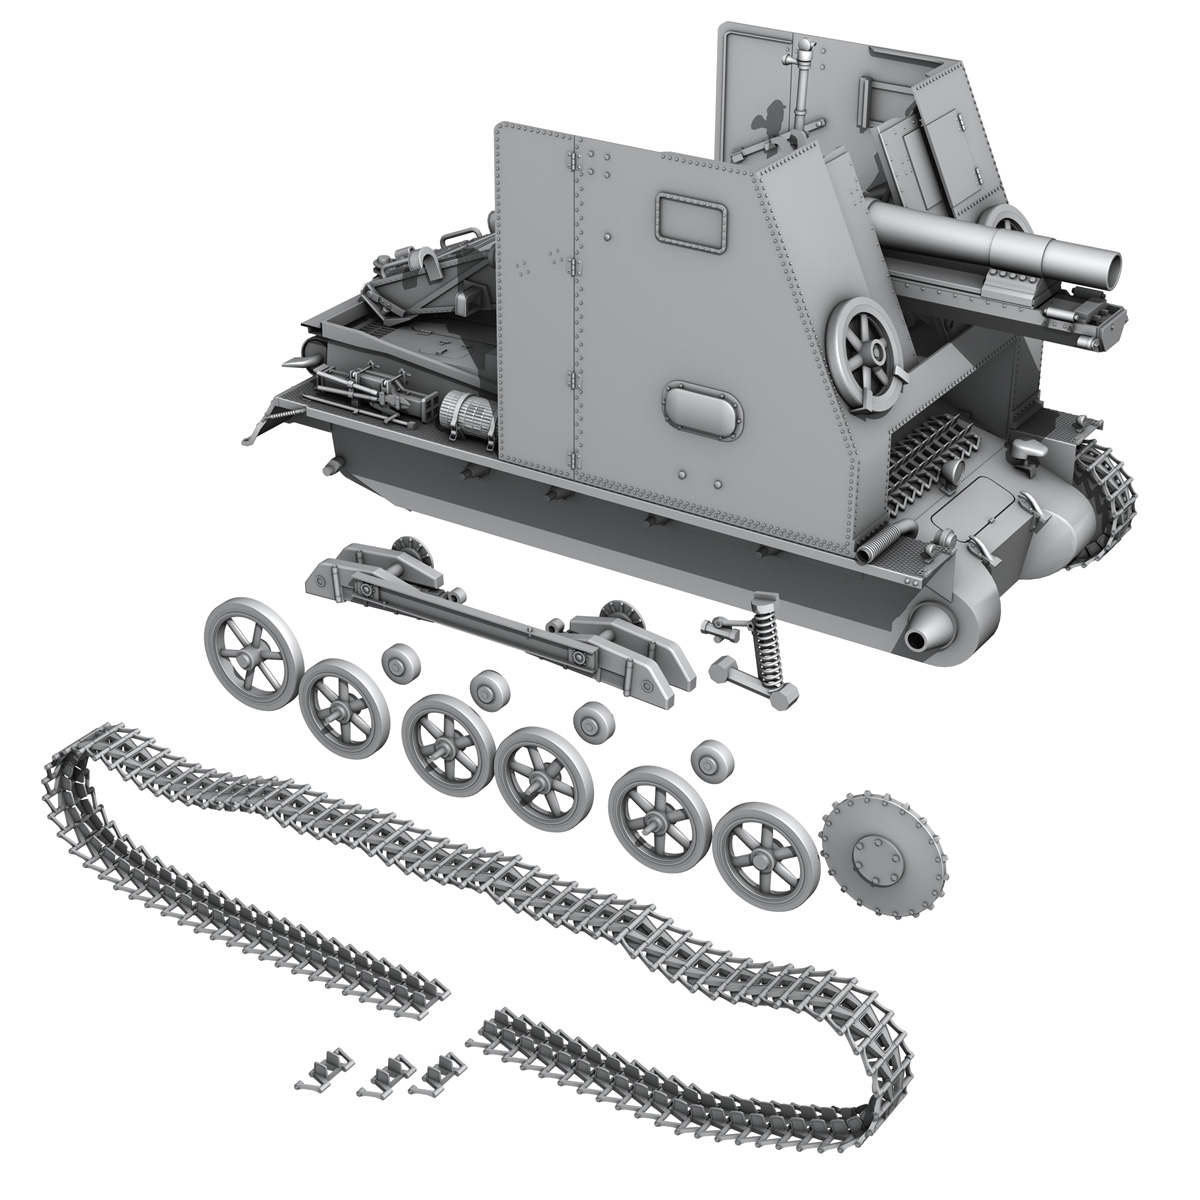 sd.kfz 101 – sturmpanzer 1 – bison 3d model 3ds fbx c4d lwo obj 189279